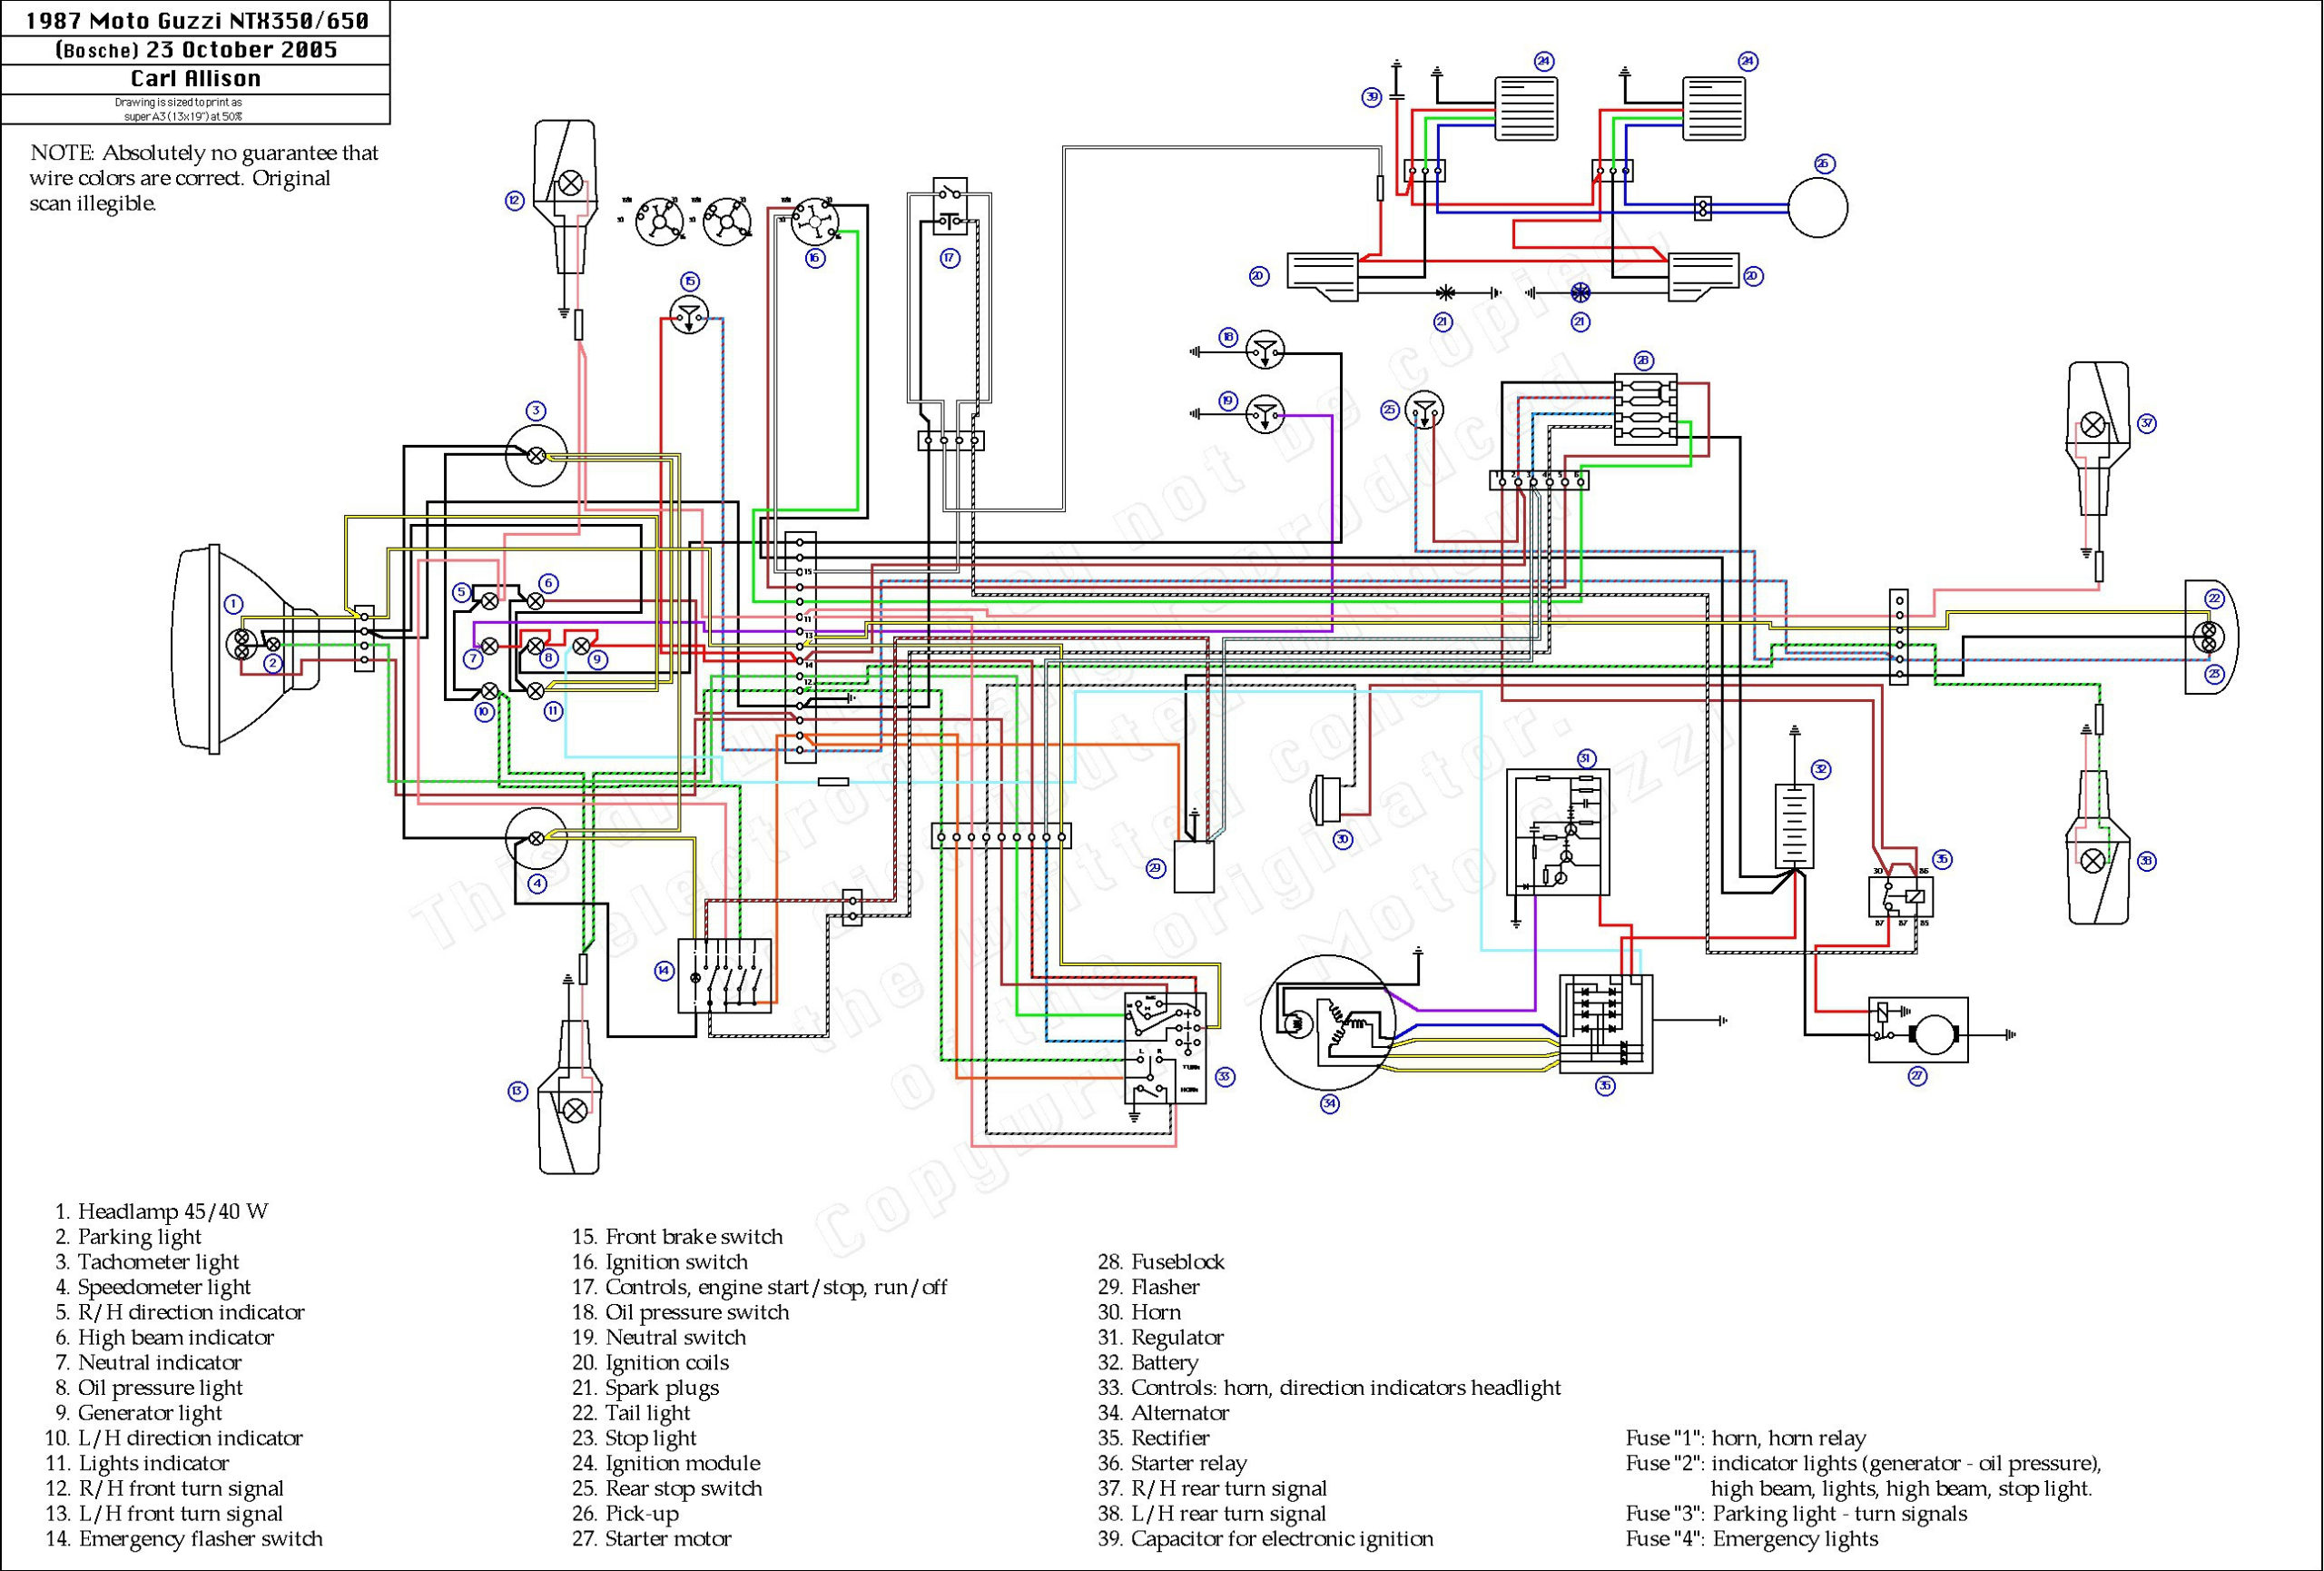 Tao Tao 110 Atv Wiring Diagram Wiring Diagram